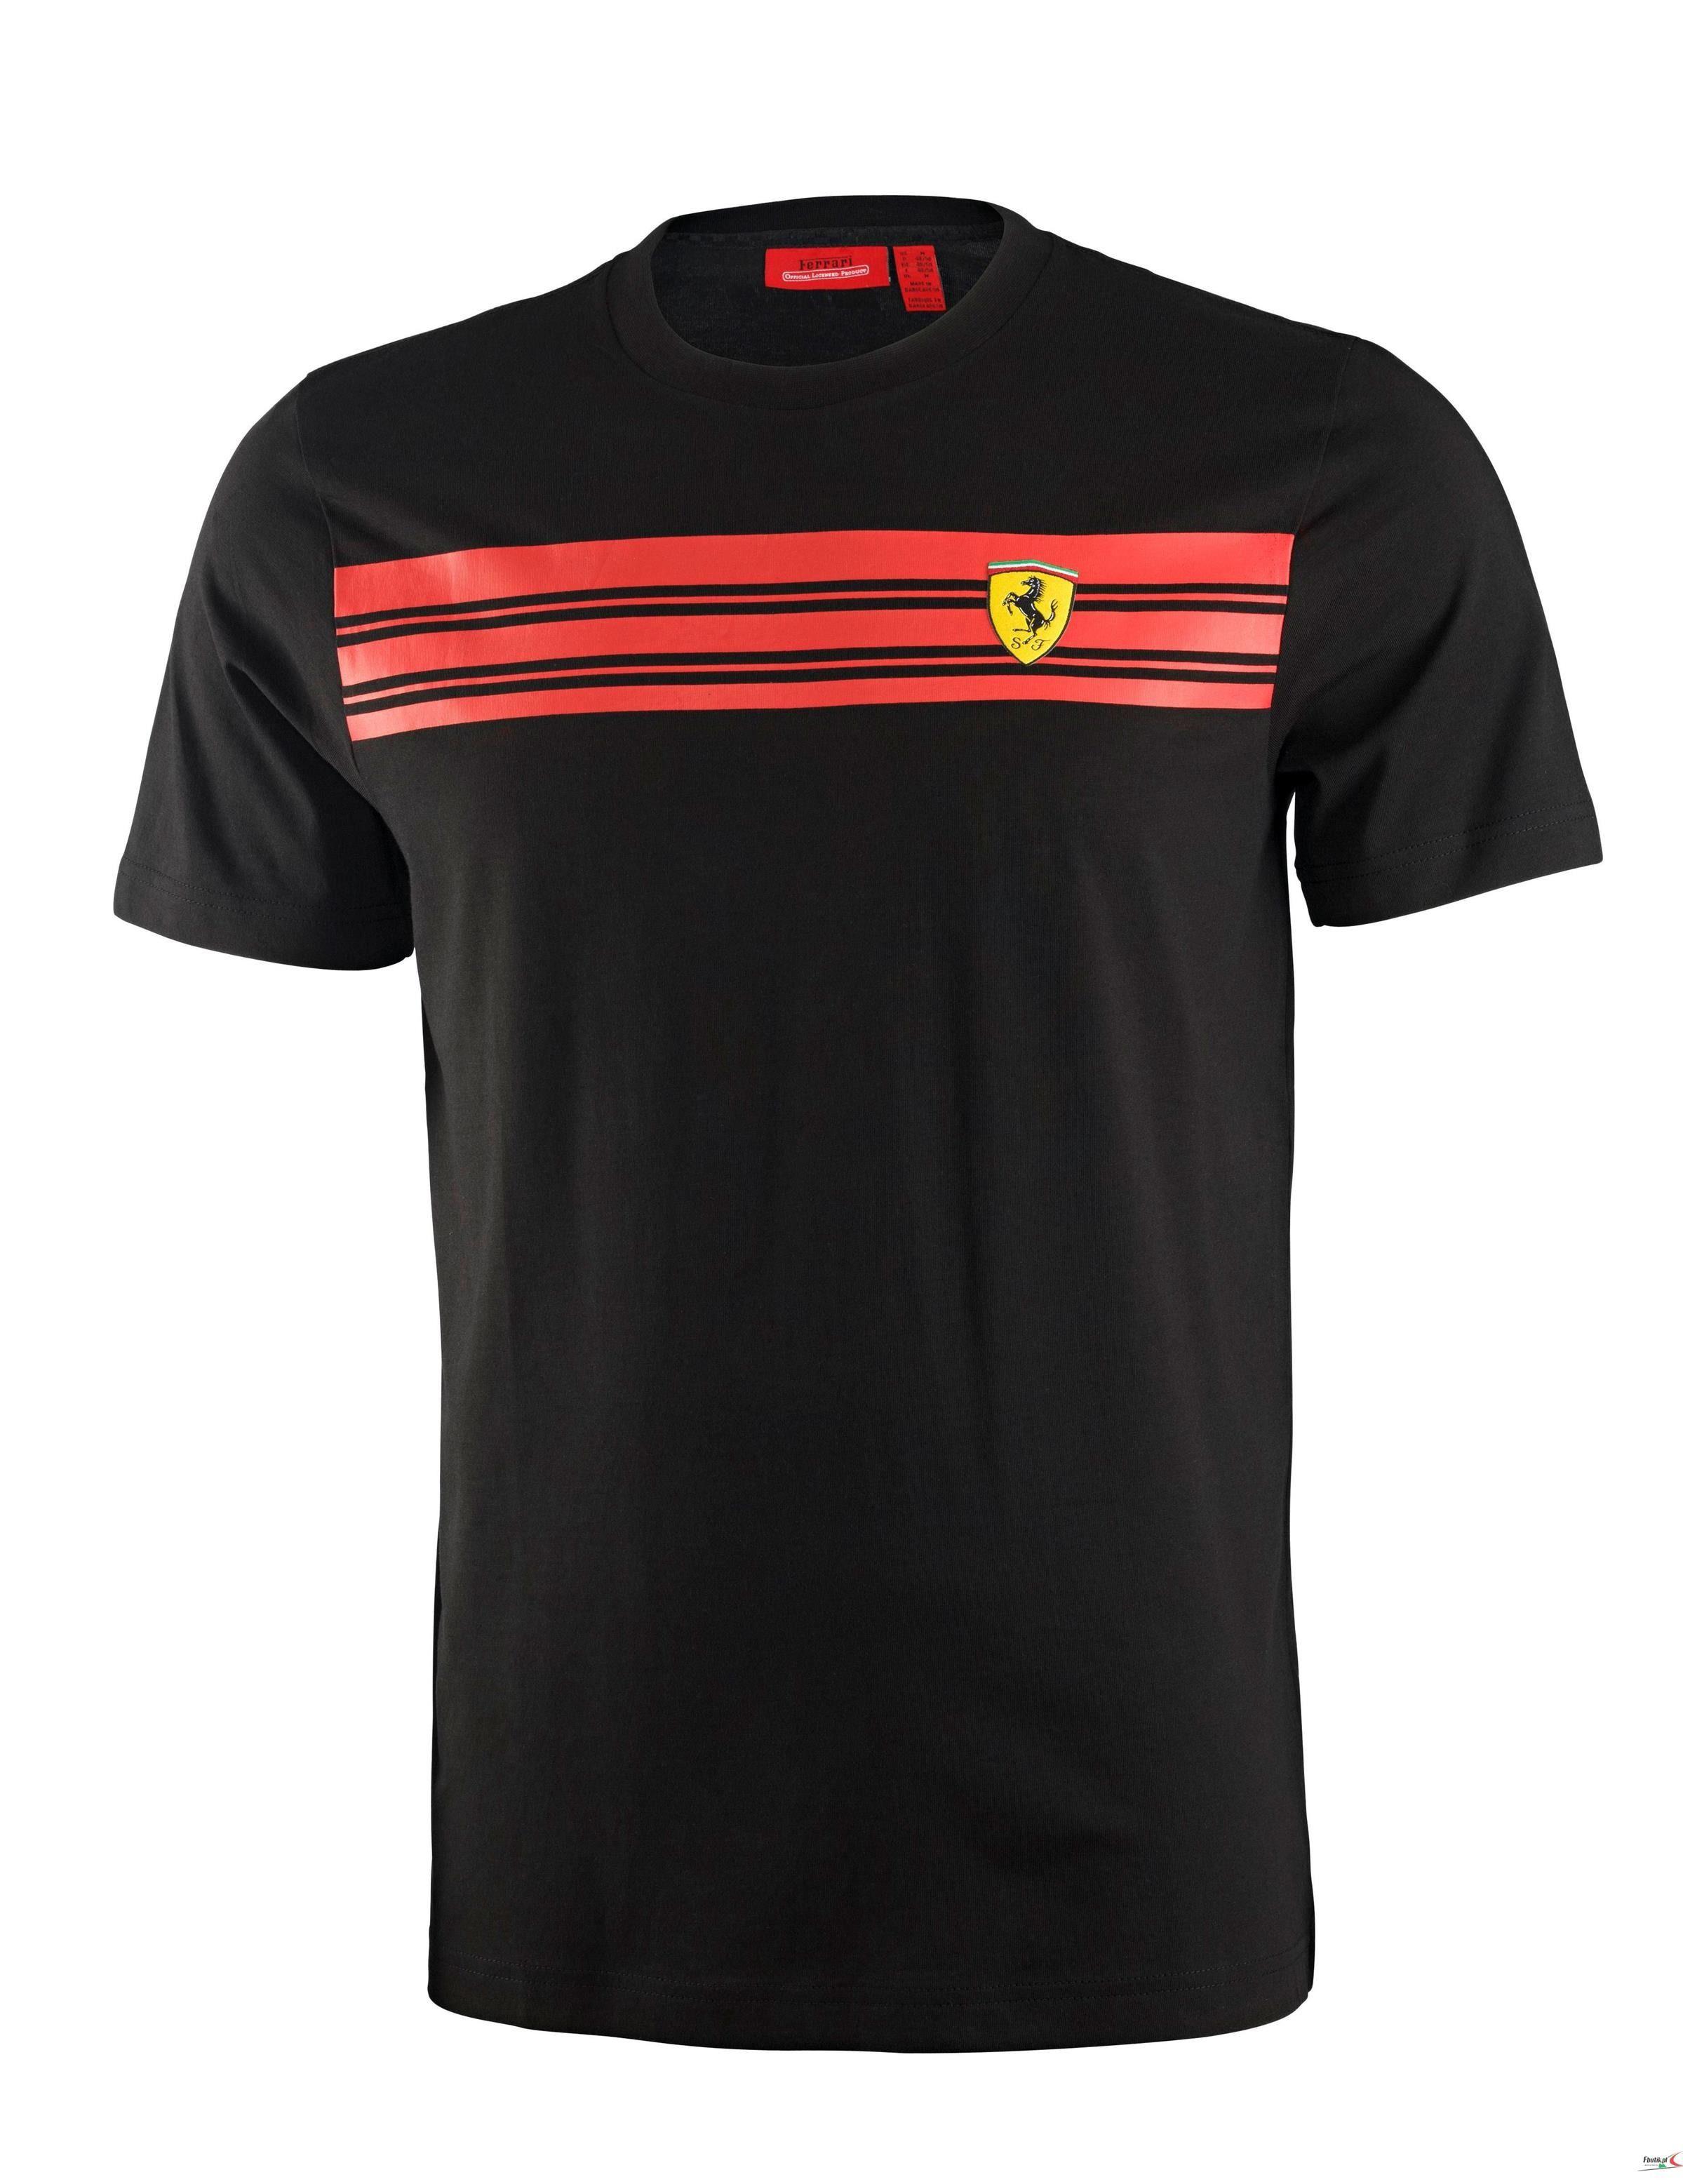 63824b71 Puma Men's Ferrari dryCELL T-Shirt - Black XL | Products | Puma mens, Puma  outfit, Shirts